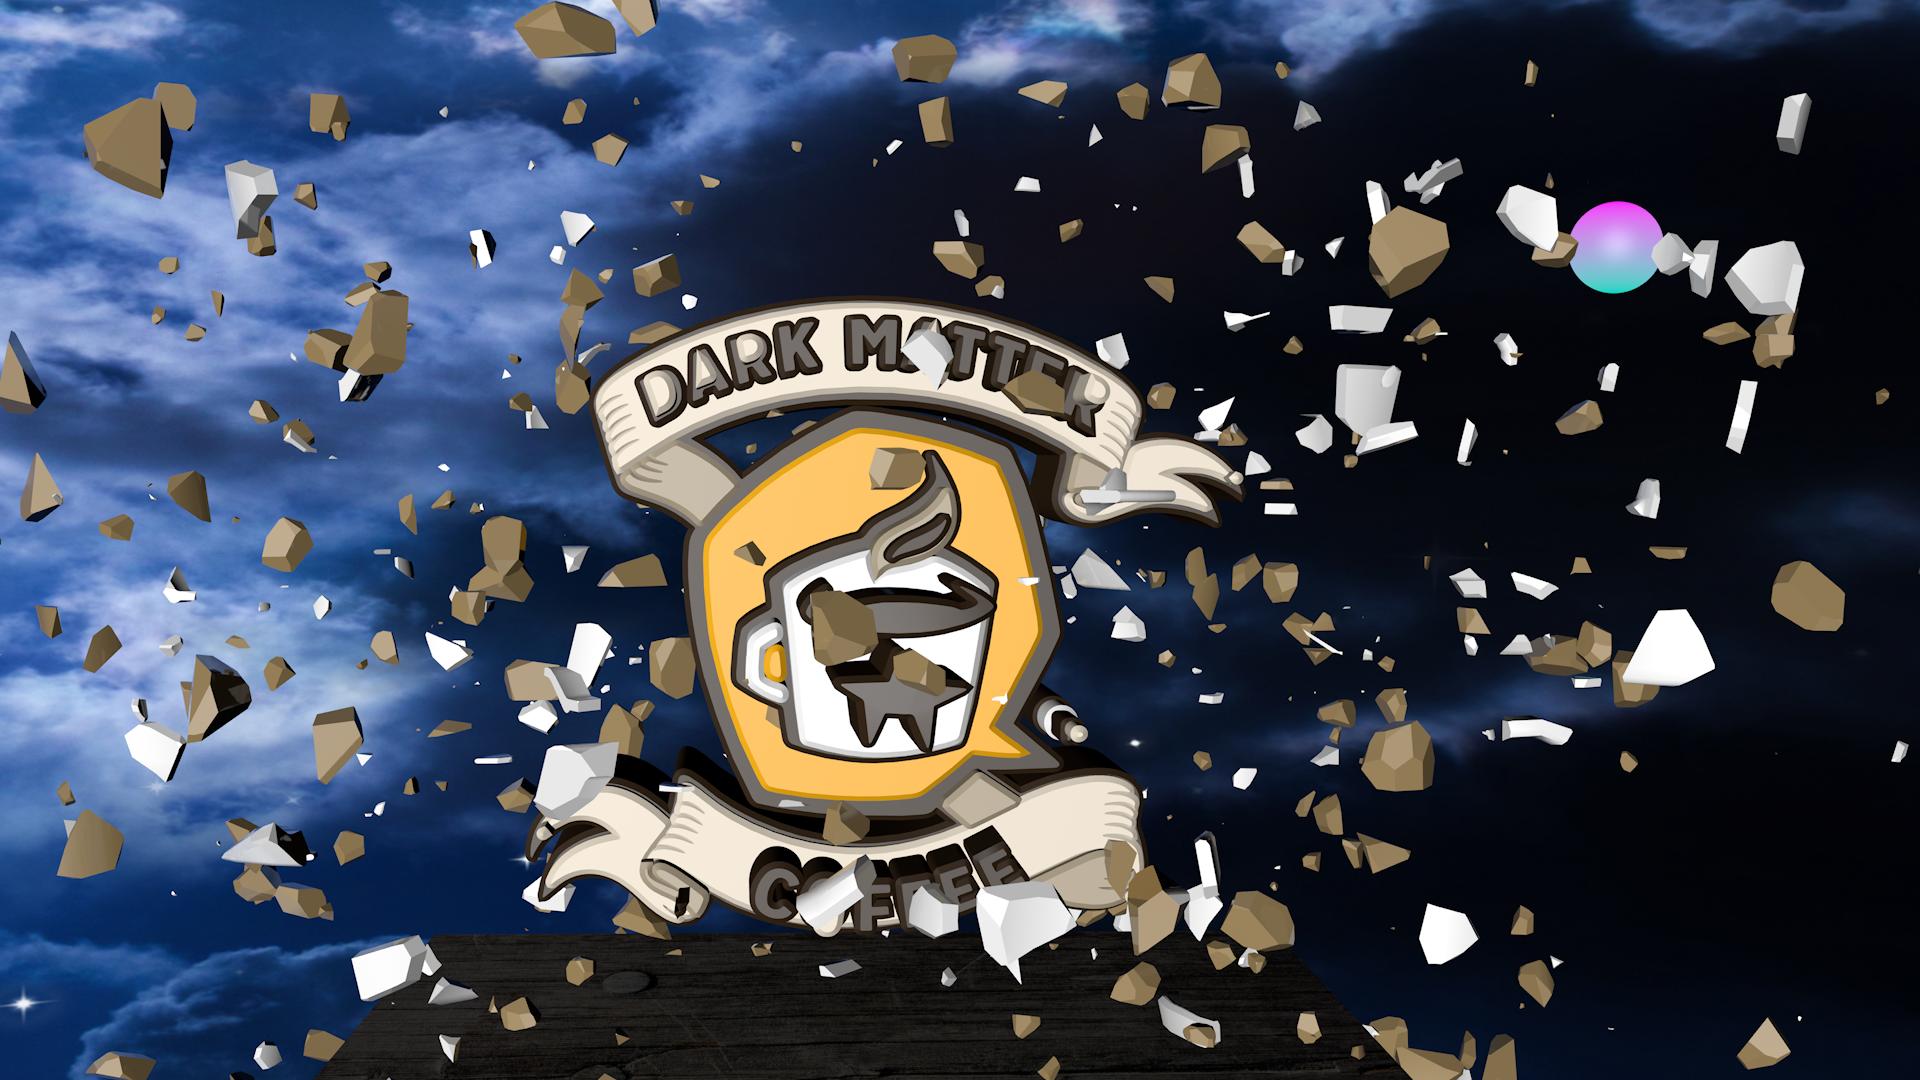 Dark Matter Logo Obliterates Coffee Cup